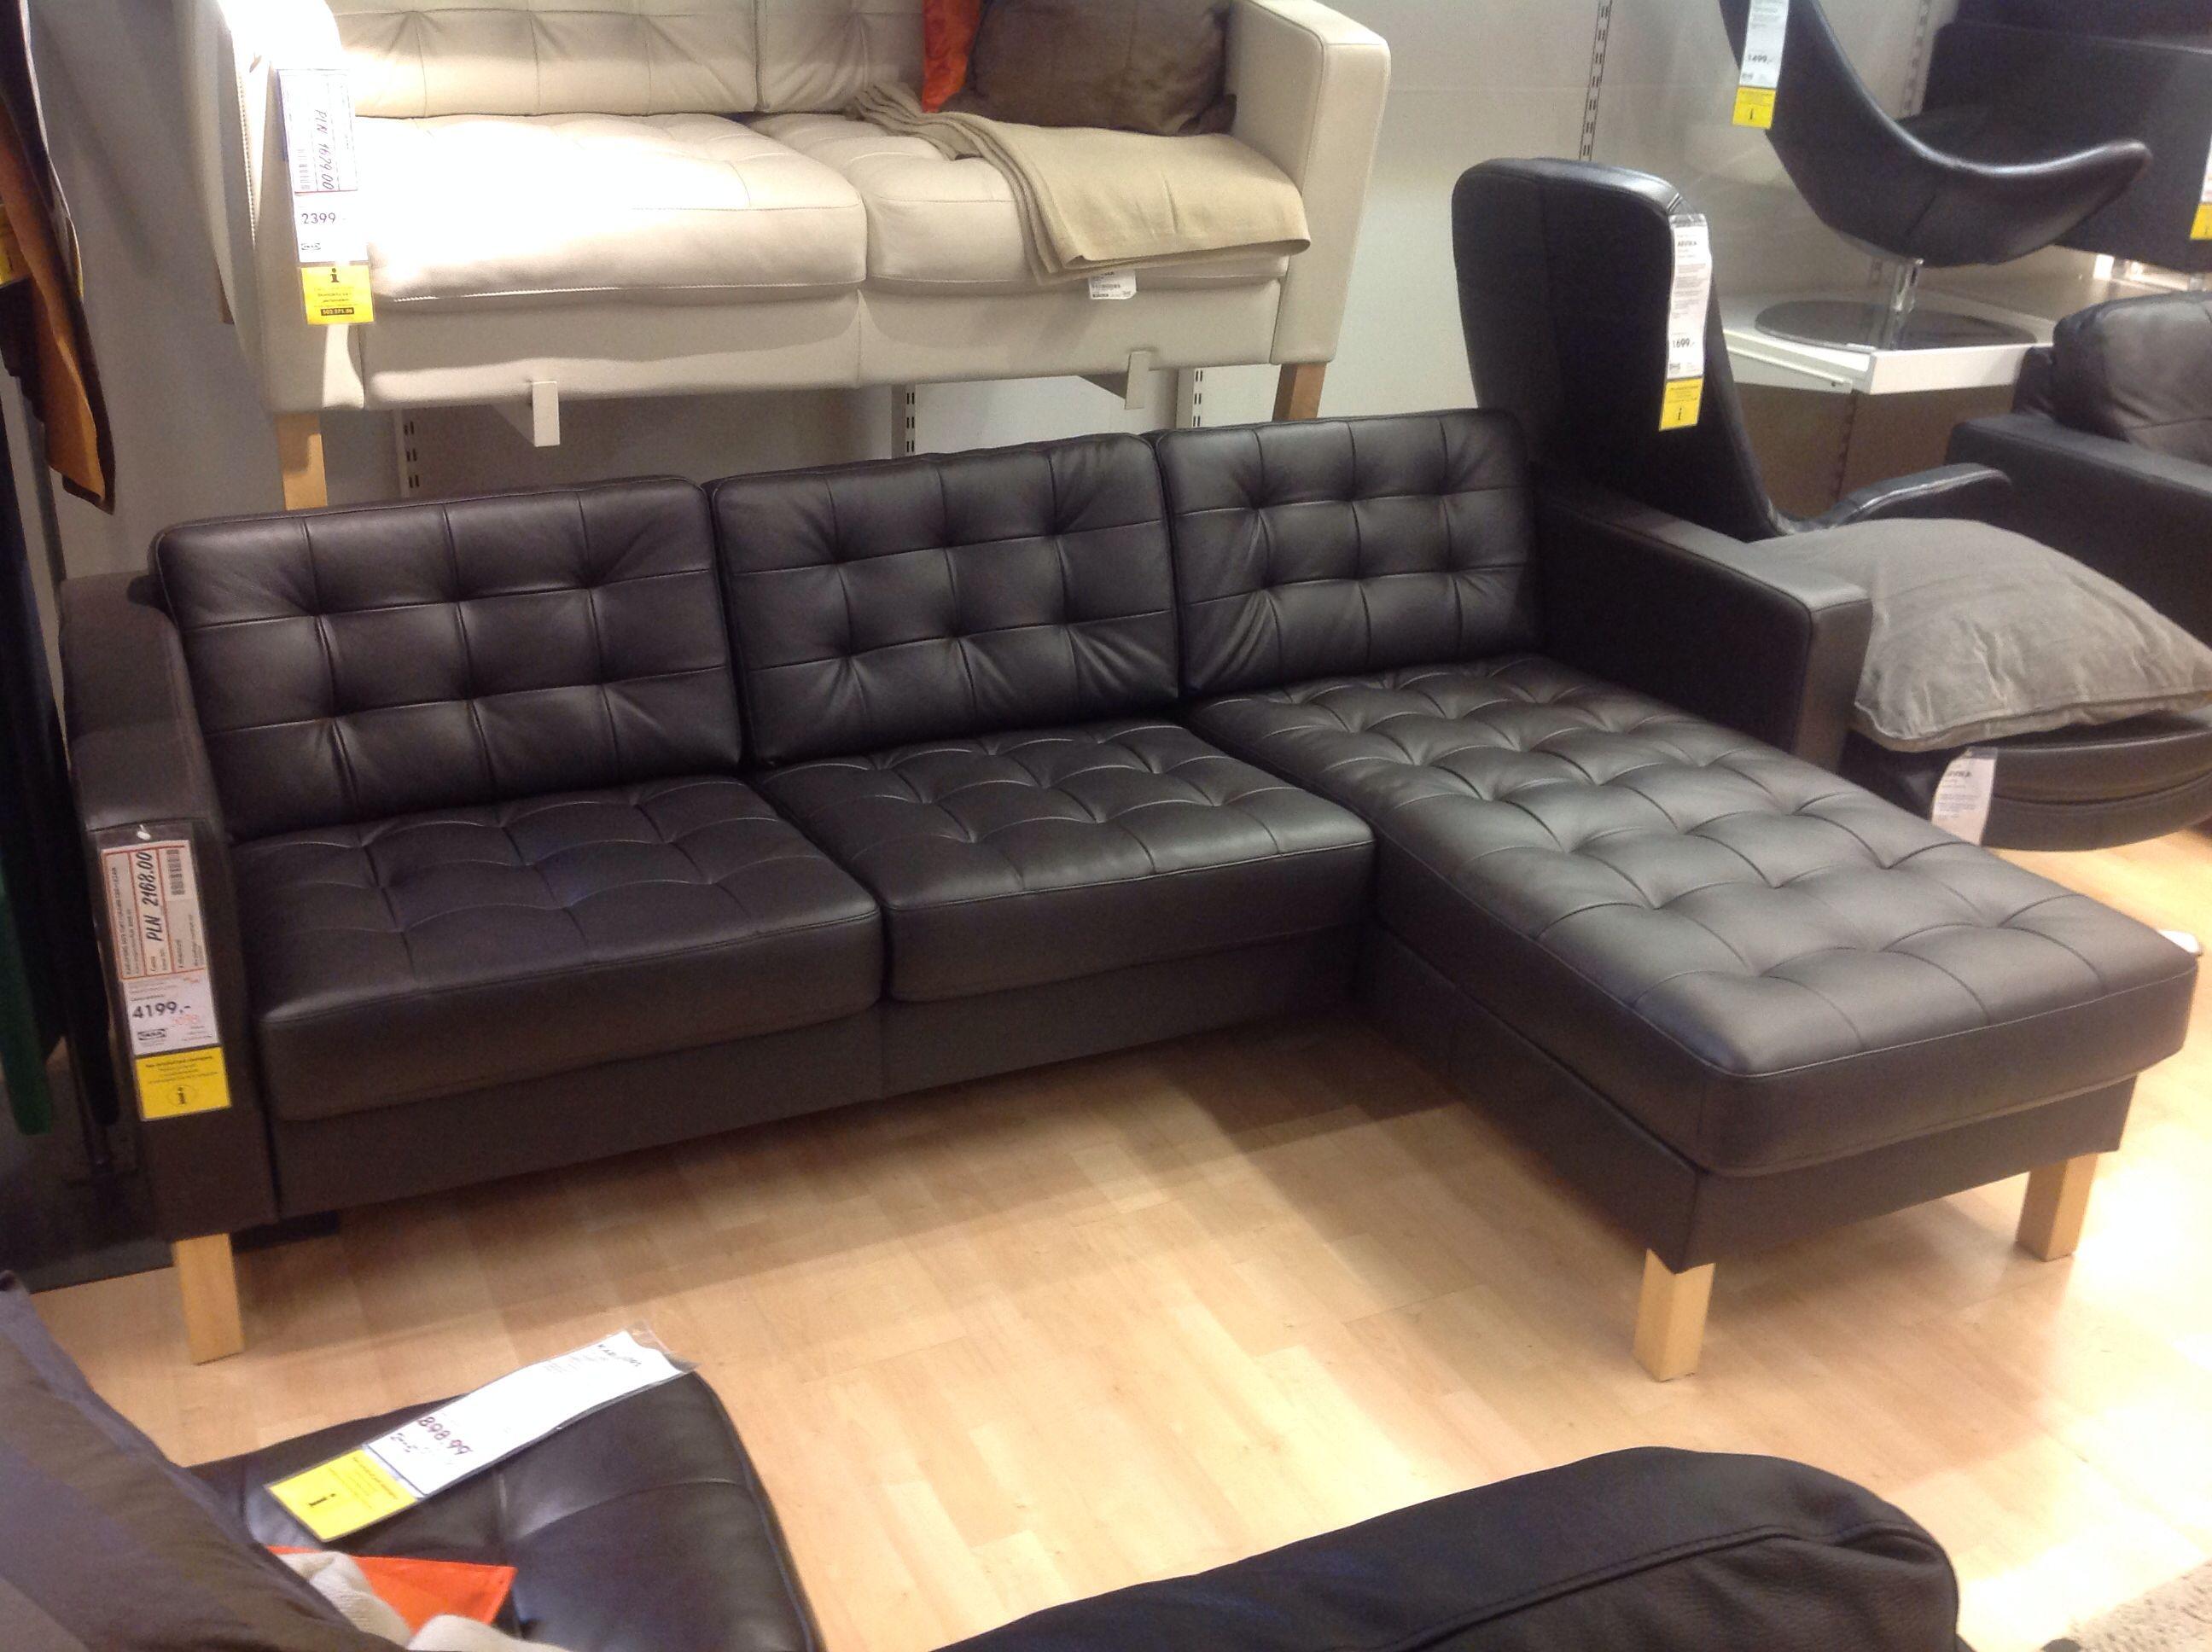 landskrona sofa Google Search Living Room Redo